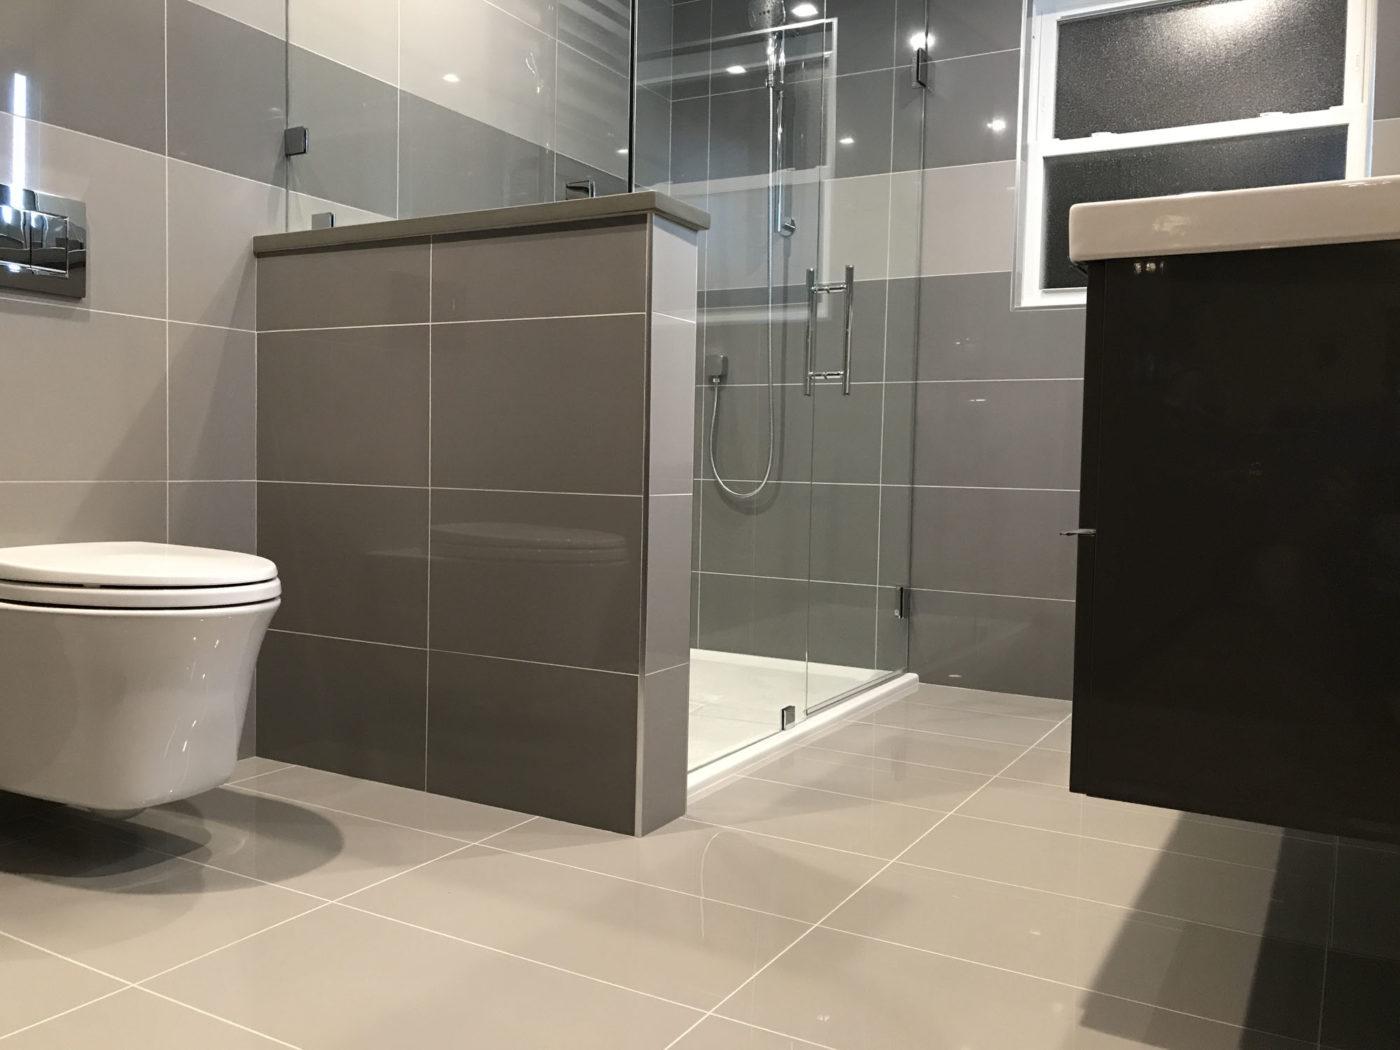 Bathroom Remodeling Schaumburg new tile and shower